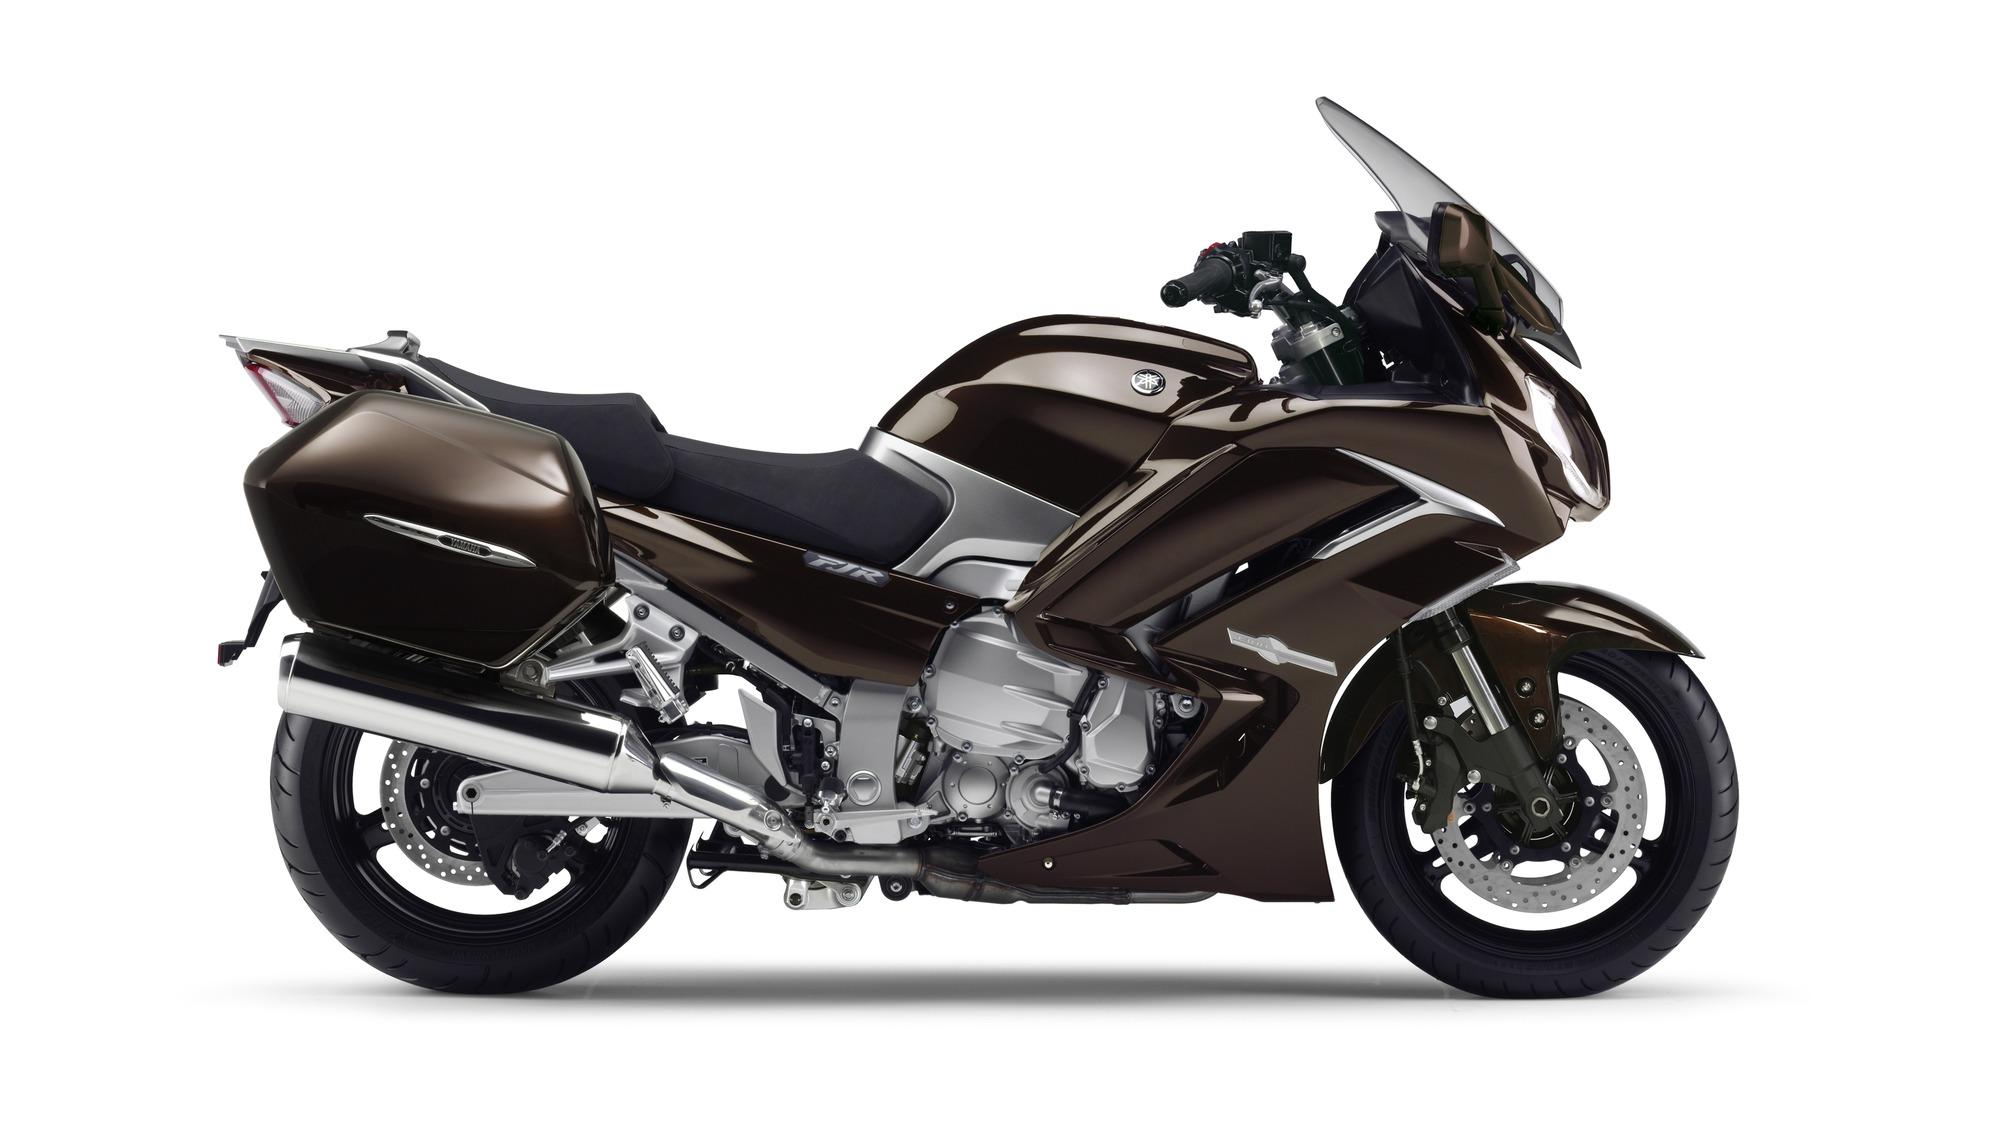 2014-Yamaha-FJR1300AE-EU-Magnetic-Bronze-Studio-002-osob